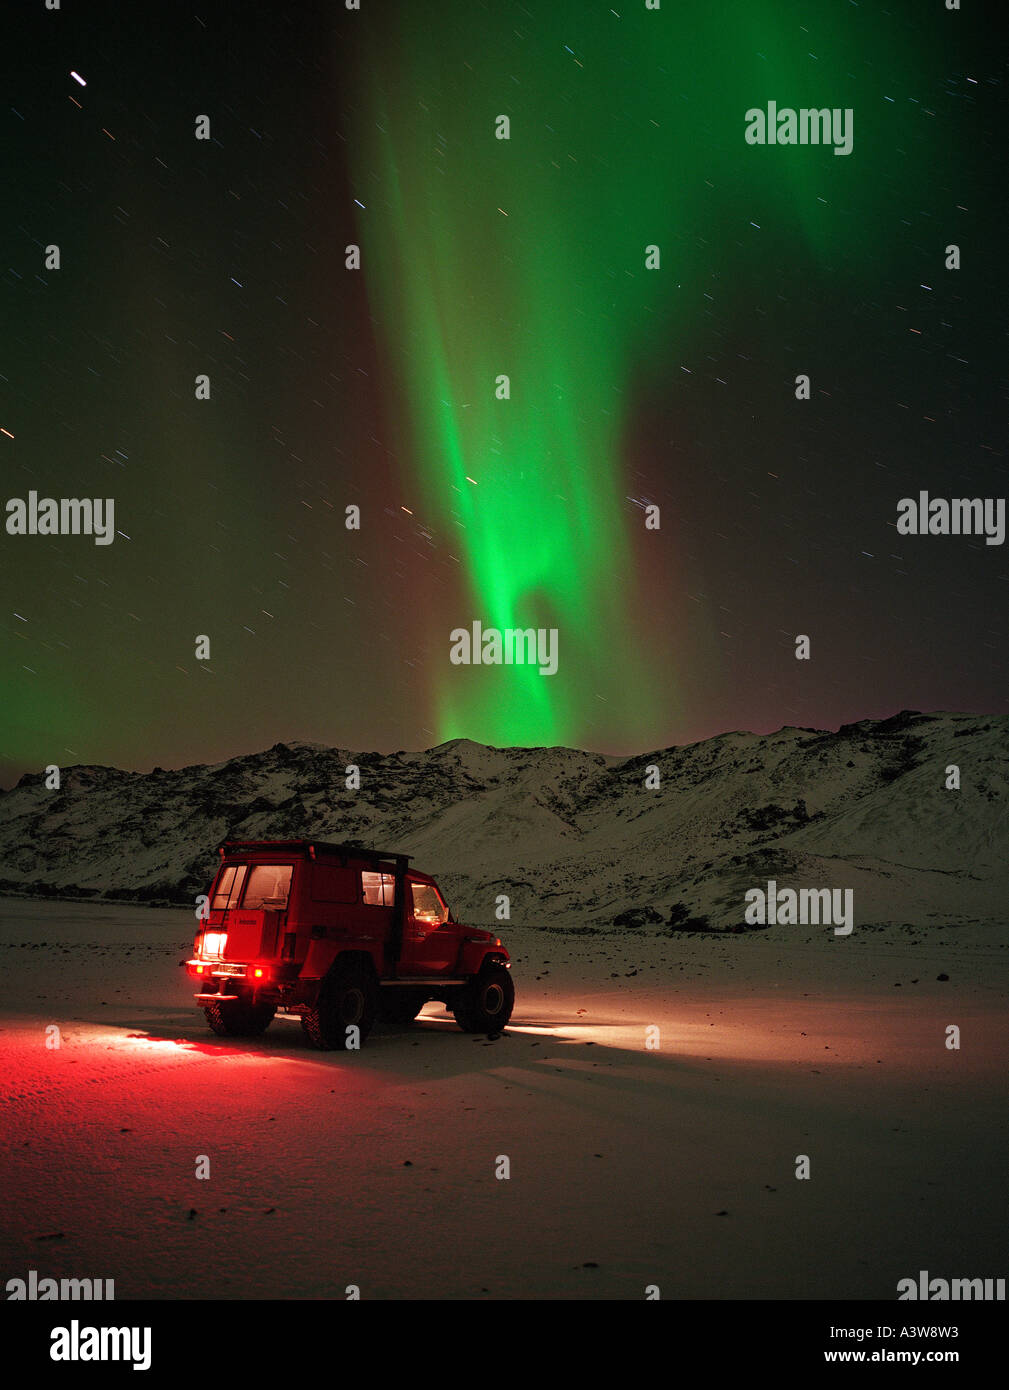 Aurora Borealis, Northern Lights, Iceland Stock Photo